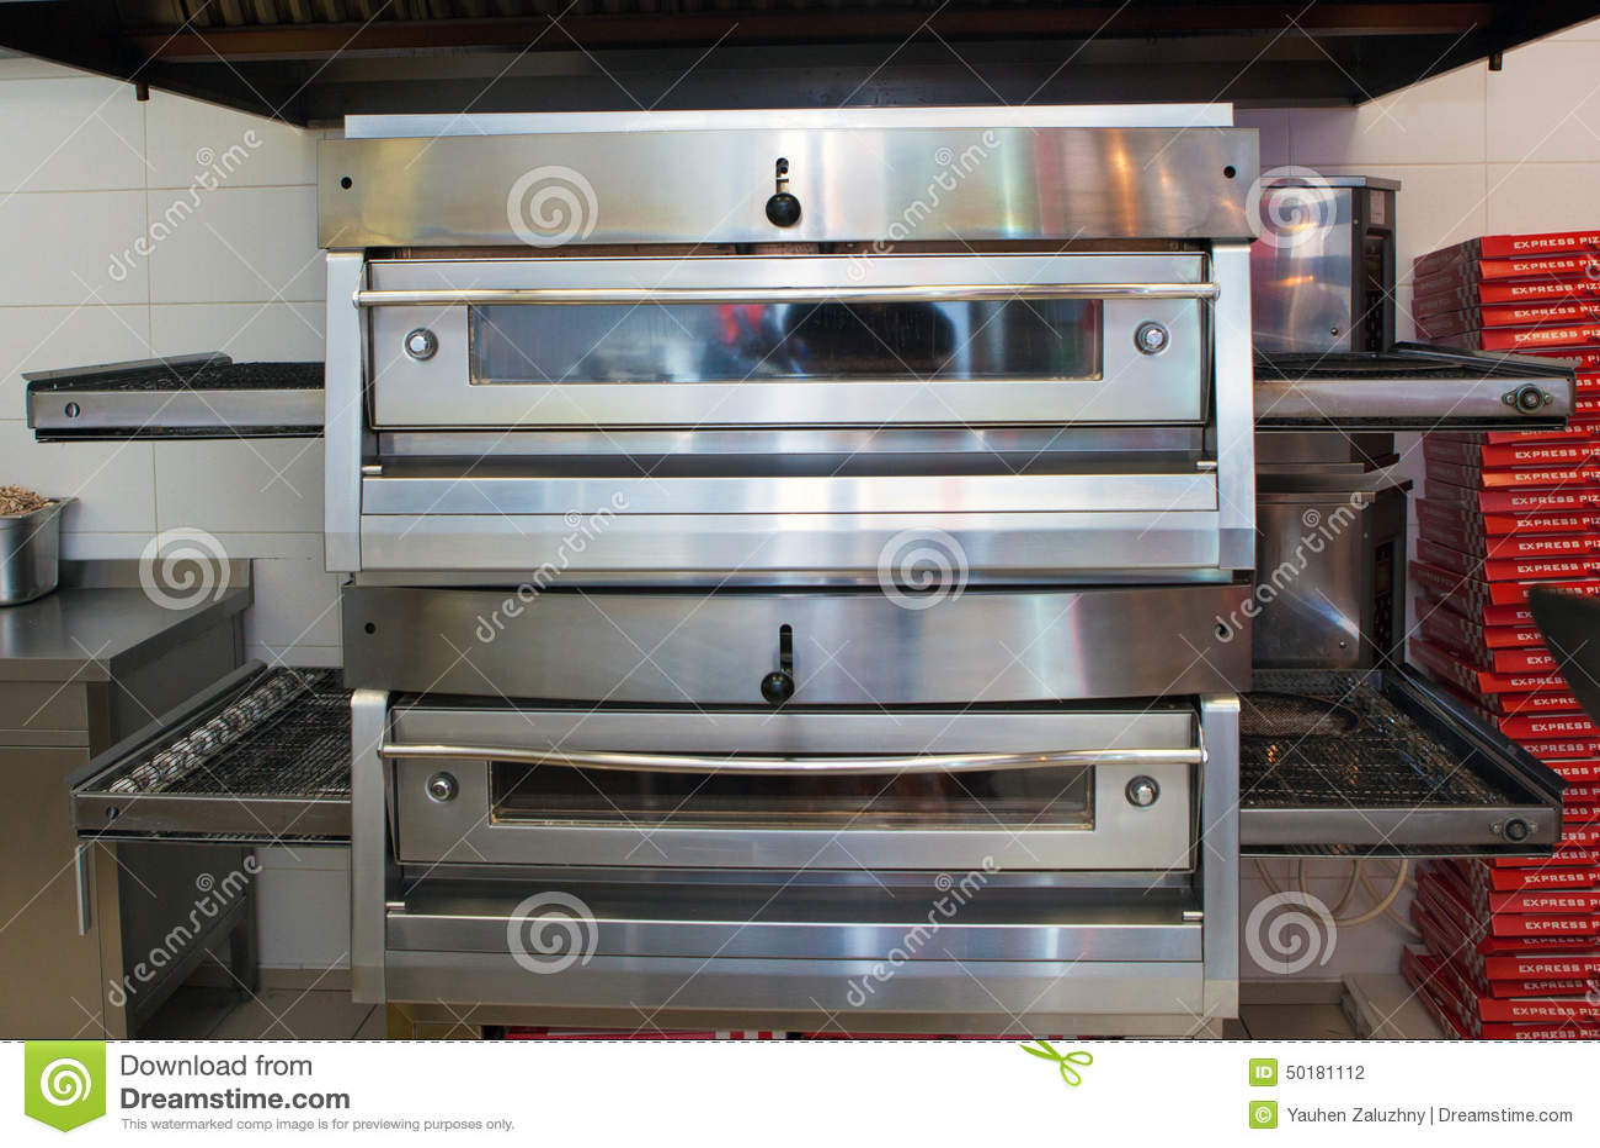 kitchen aid ovens tall cabinet with doors 按流程图薄饼 薄饼烤箱库存照片 图片包括有烤箱 生产 厨具 工具 薄饼烤箱 薄饼 薄饼的生产的 为做薄饼 部分厨房 厨房单位 薄饼的辅助流程图的一个工具一个设备